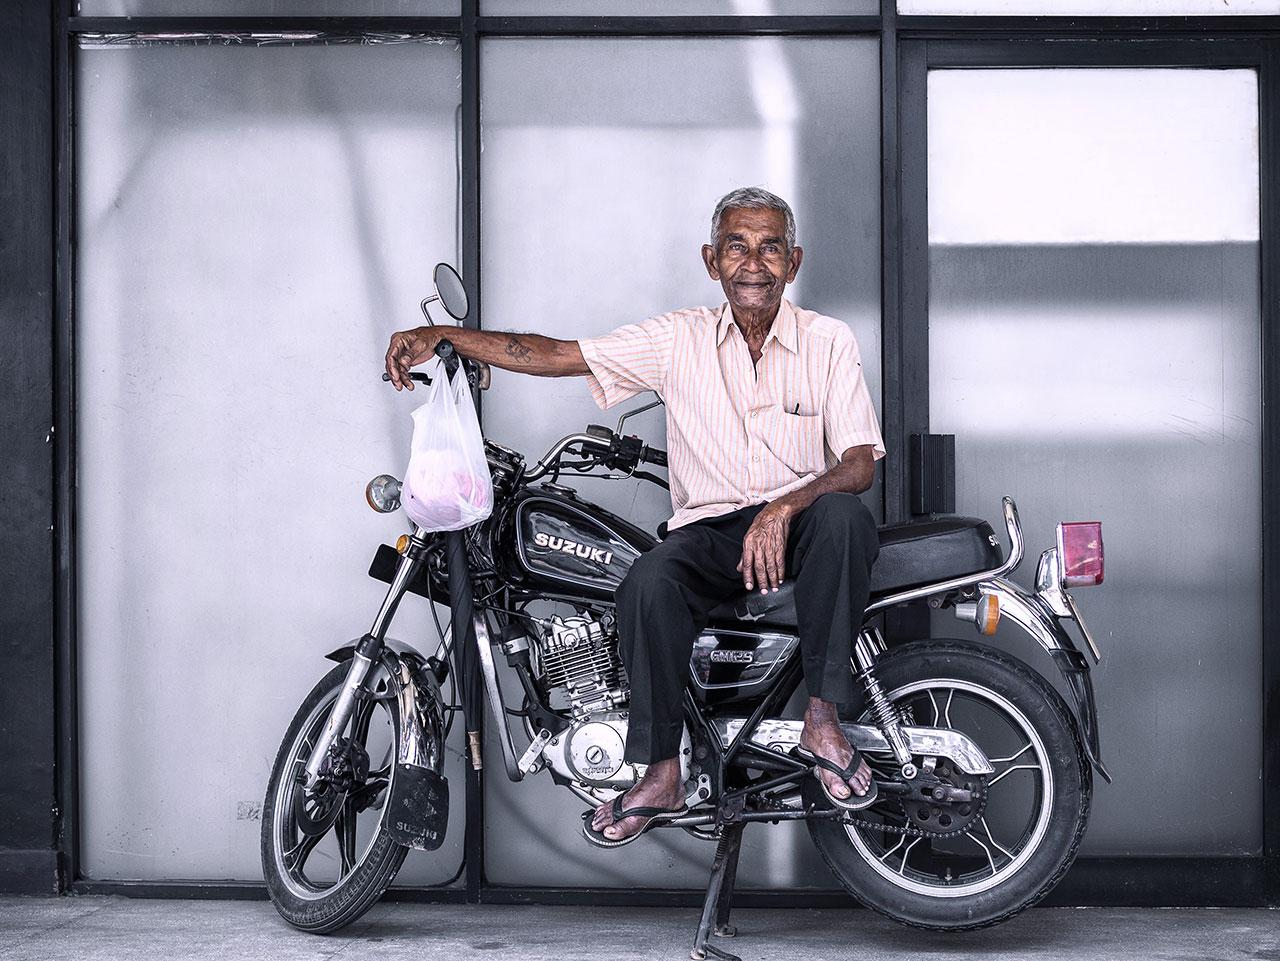 Sri Lanka Man Portrait Motorbike